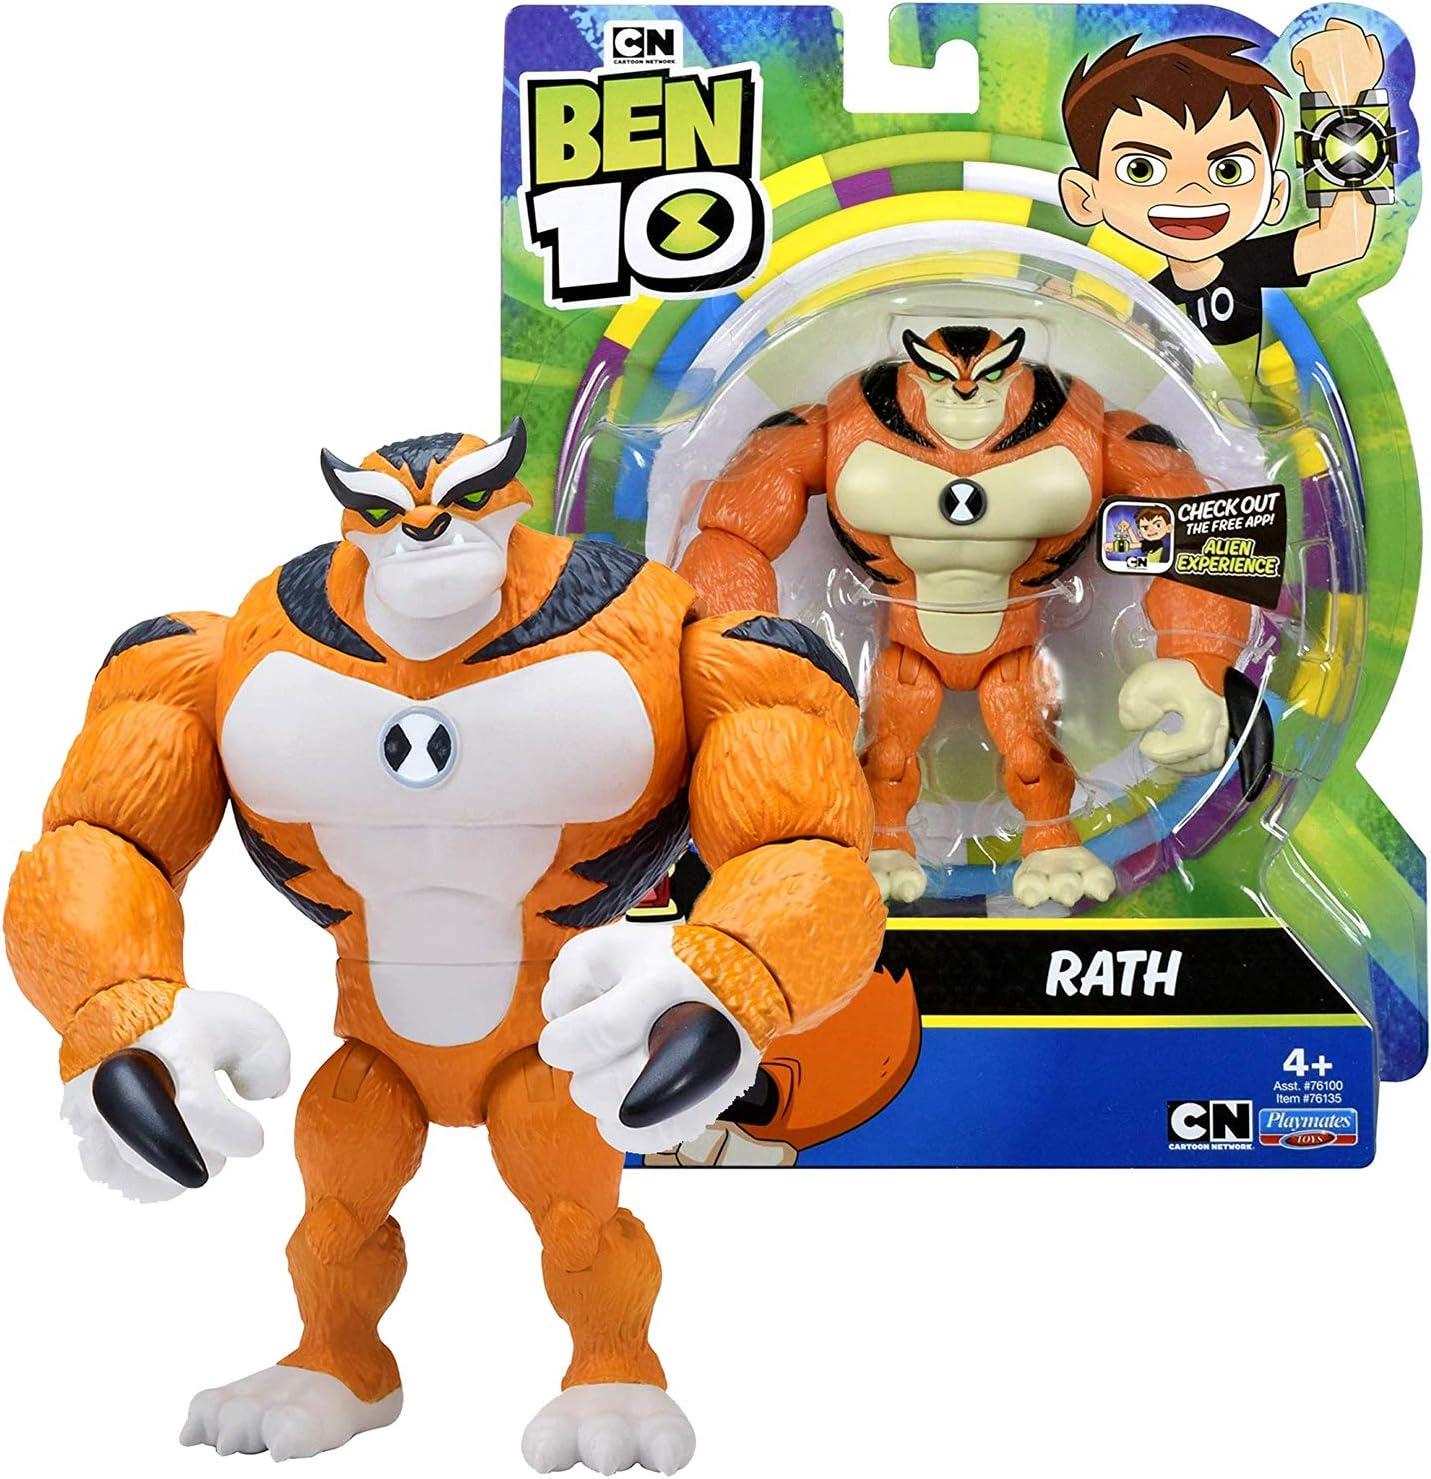 Playmates Toys Cartoon Network Ben 10 Rath Action Figure